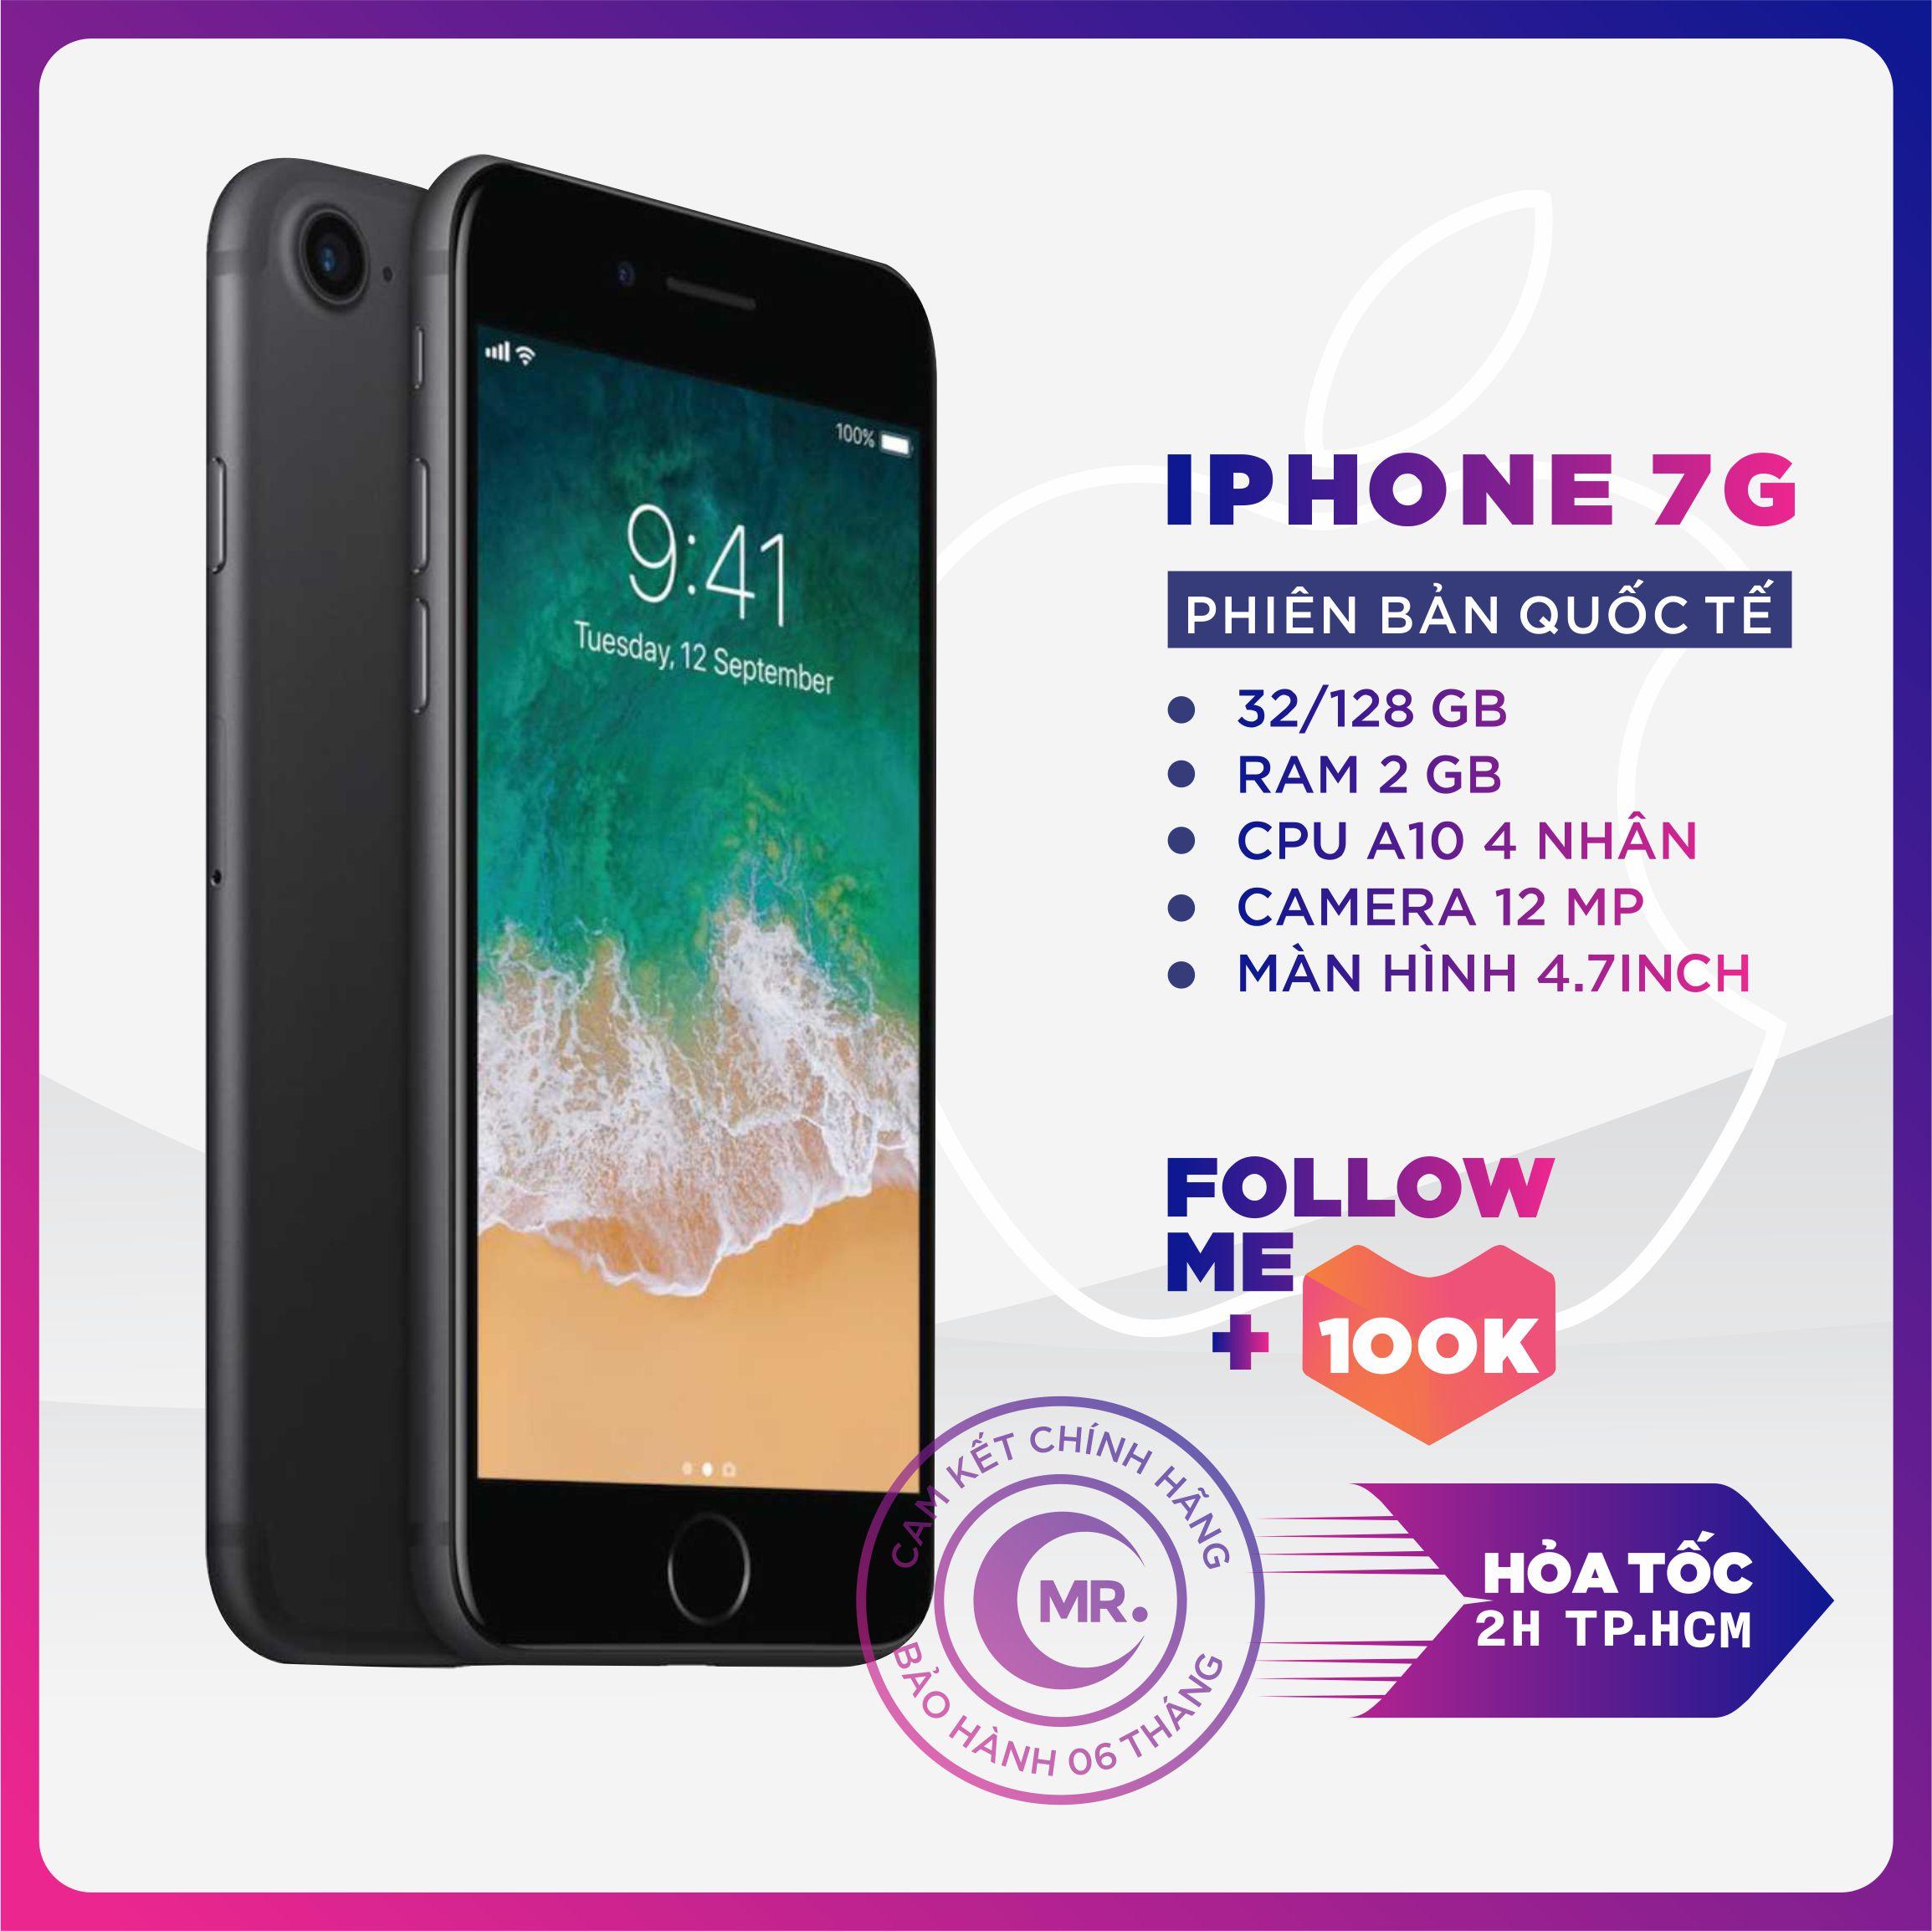 ( FREE VOCHER 350K 15-18/4) Điện thoại Apple iPhone 7 32GB 128GB QUỐC TẾ RAM 2 GB Quad-core 2.34GHz Chipset...